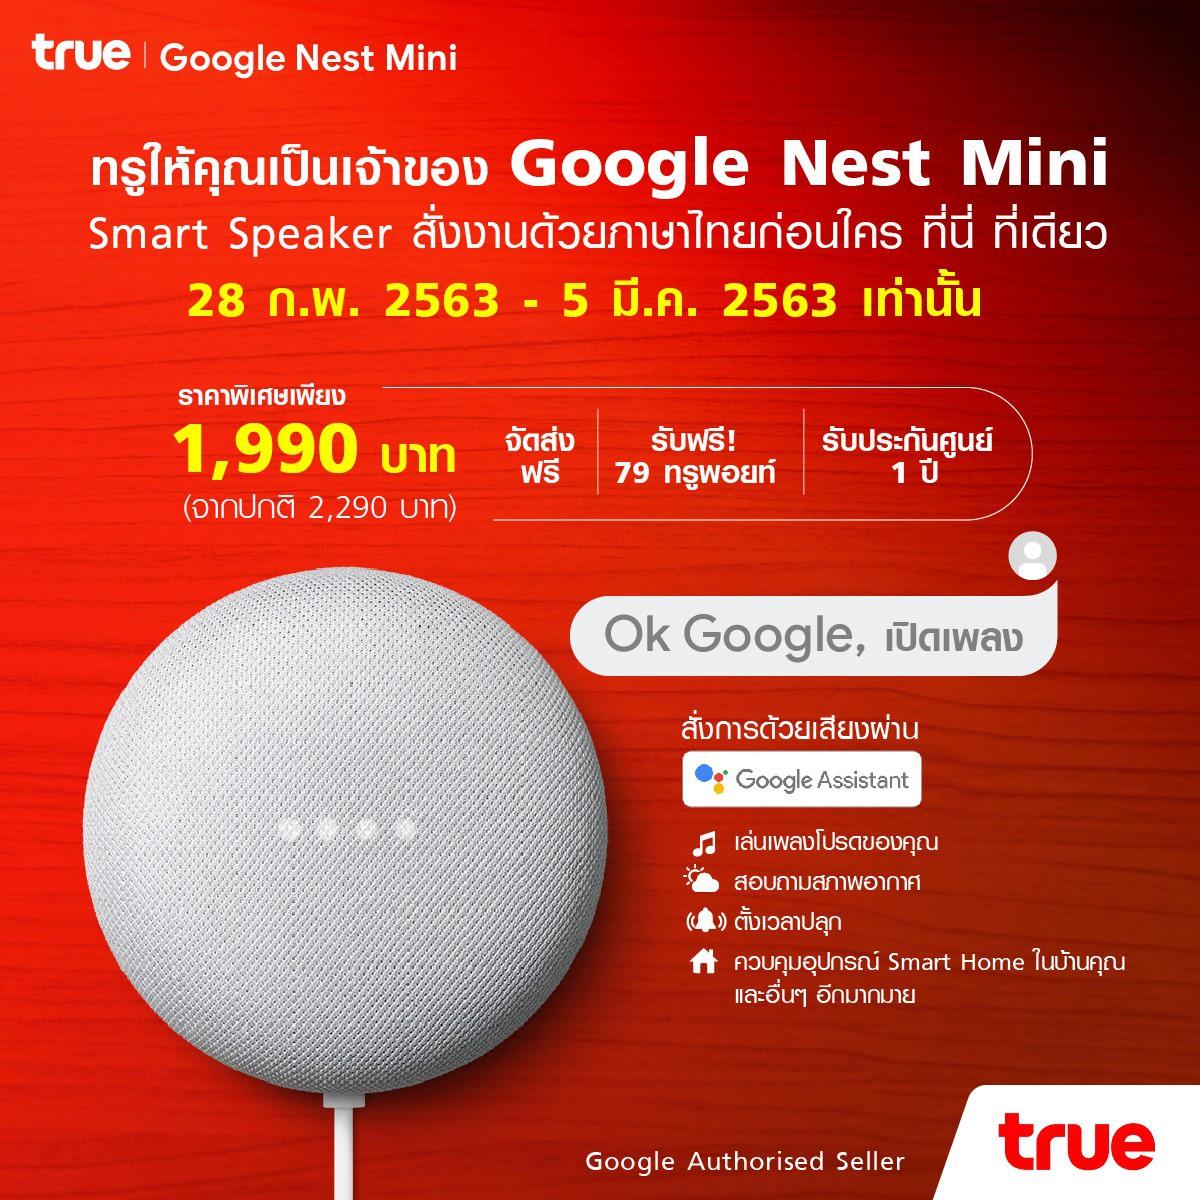 True เปิดจอง Google Nest Mini เวอร์ชั่นภาษาไทย ที่เว็บ TrueStore 28 ก.พ. – 5 มีนาคมนี้